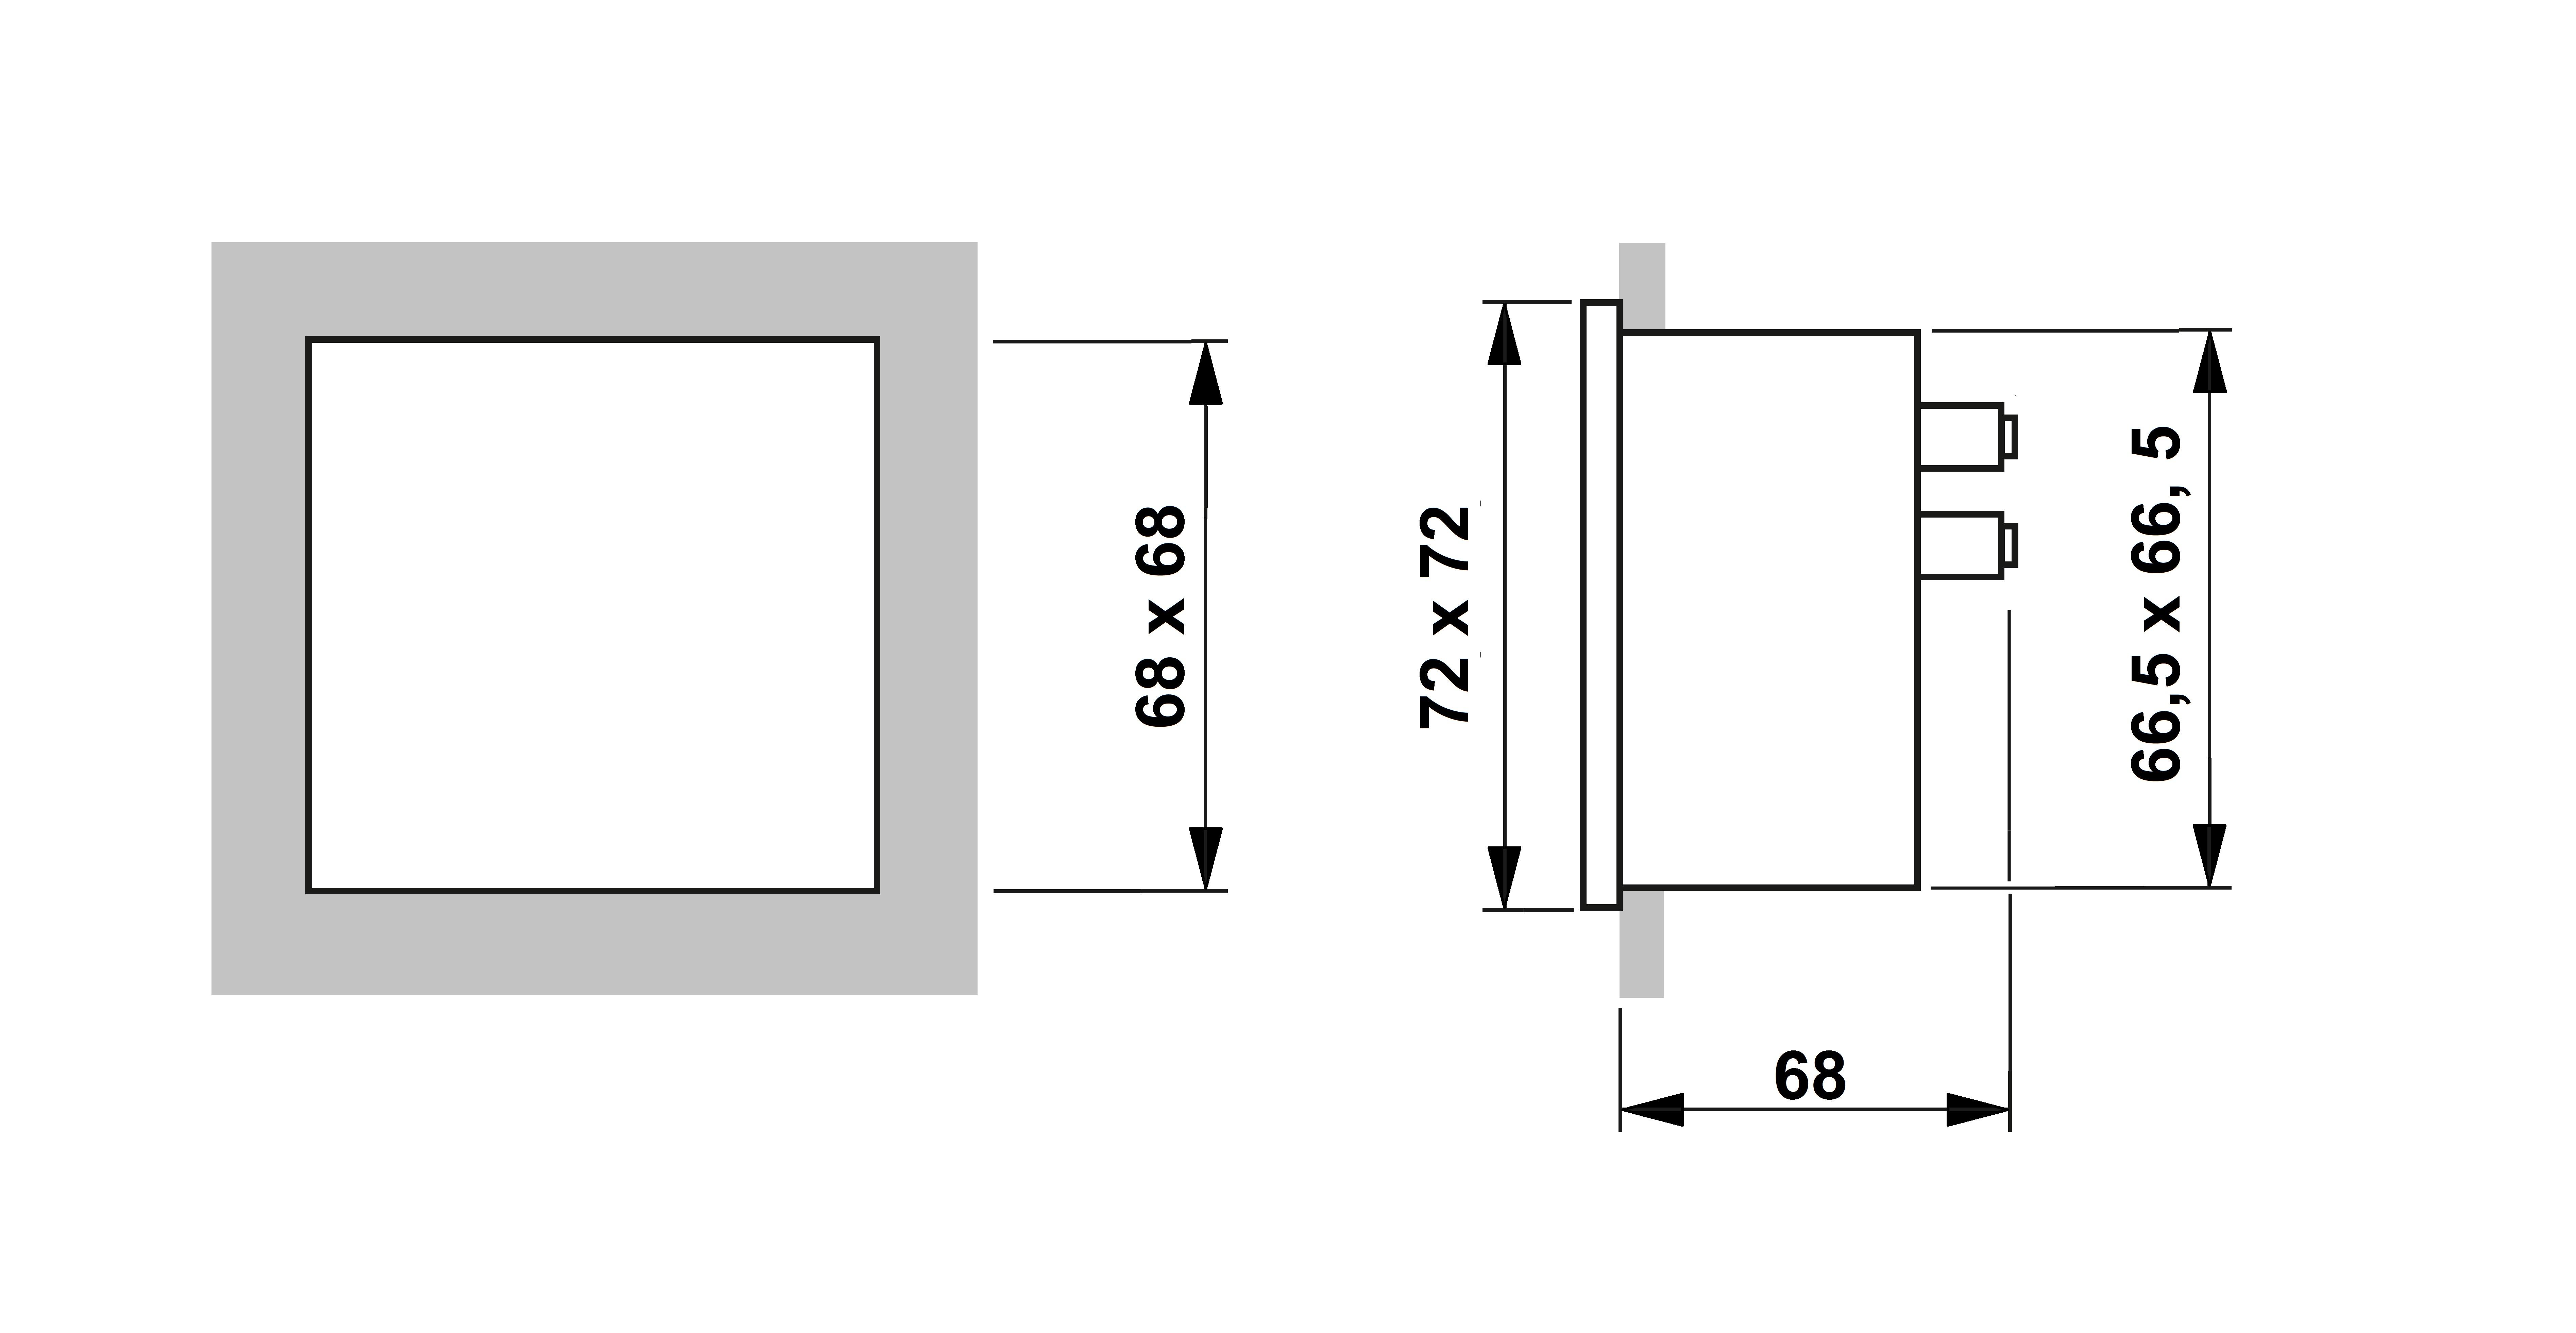 Voltmeter 72x72mm 30 Vdc Emall Australia Schematic Cad File